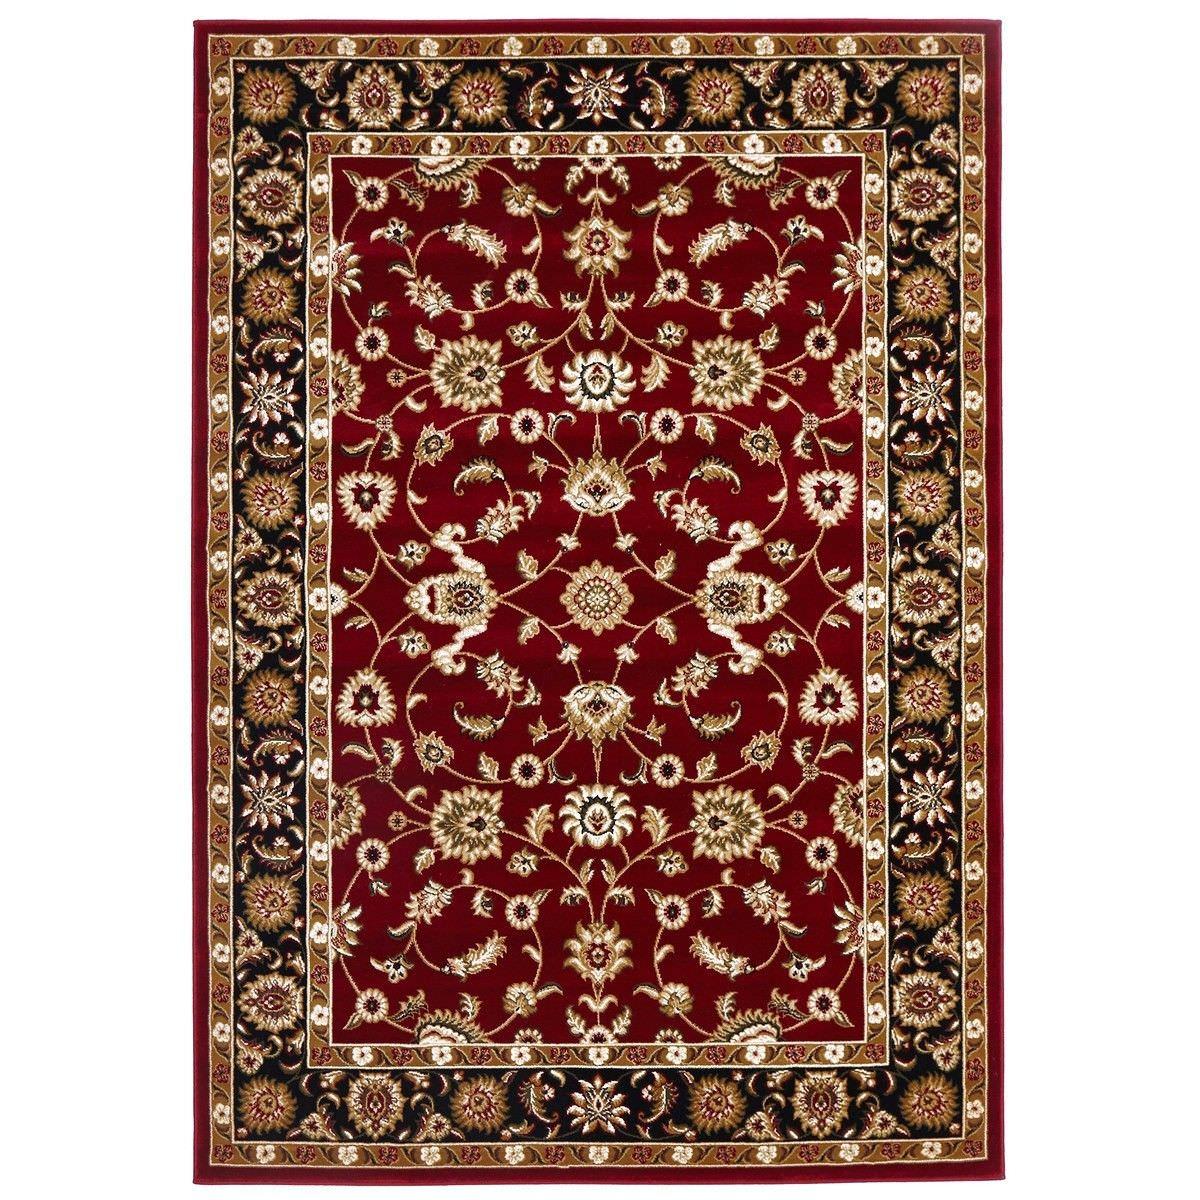 Sydney Classic Turkish Made Oriental Rug, 330x240cm, Red / Black